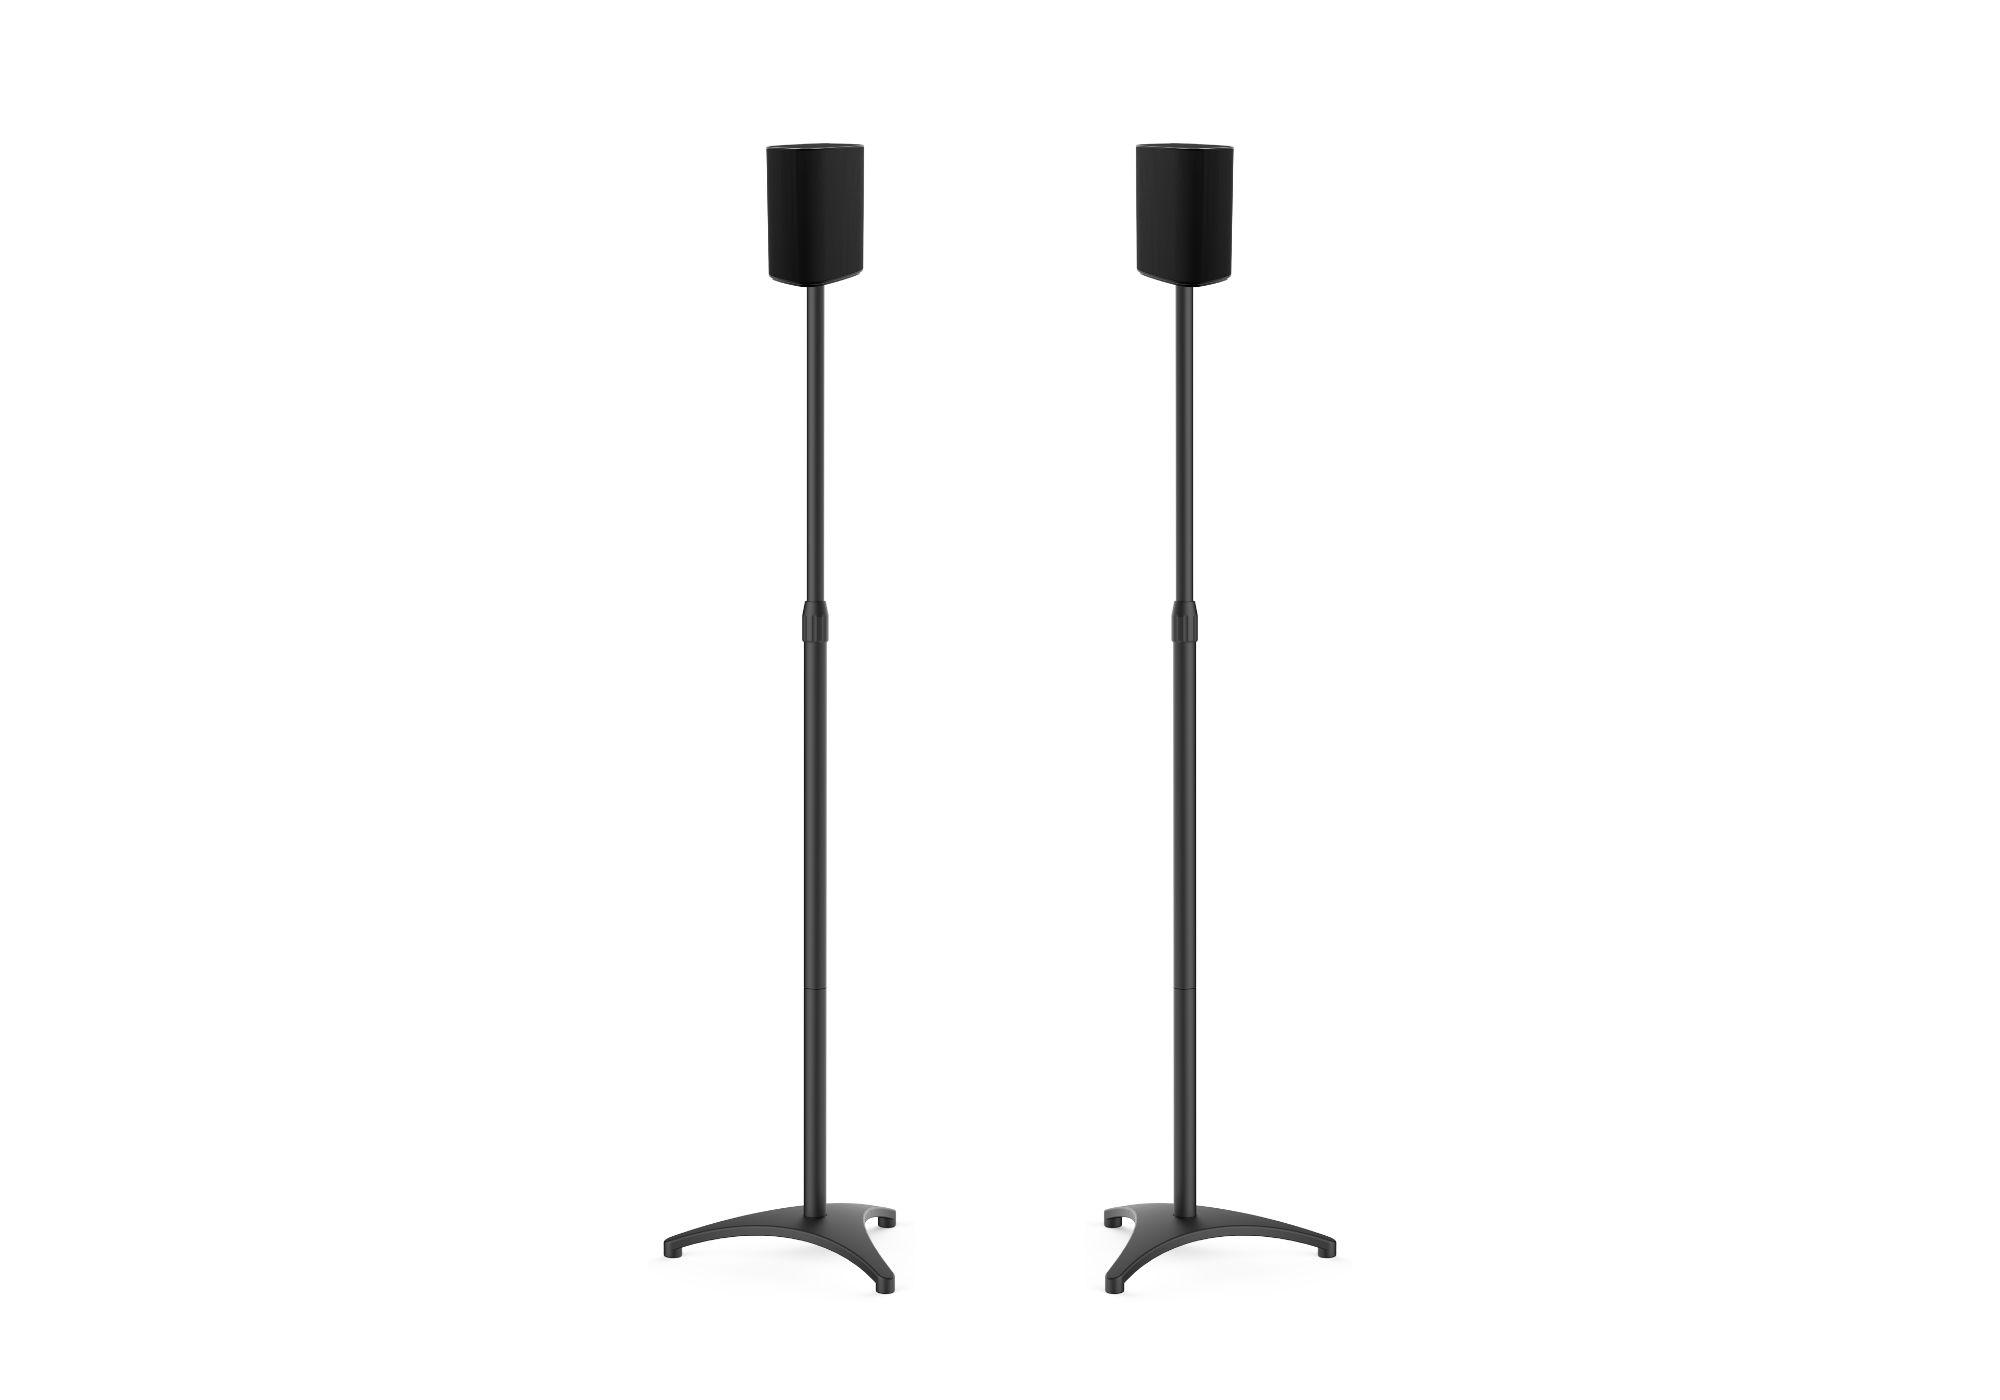 milan speakers in stands